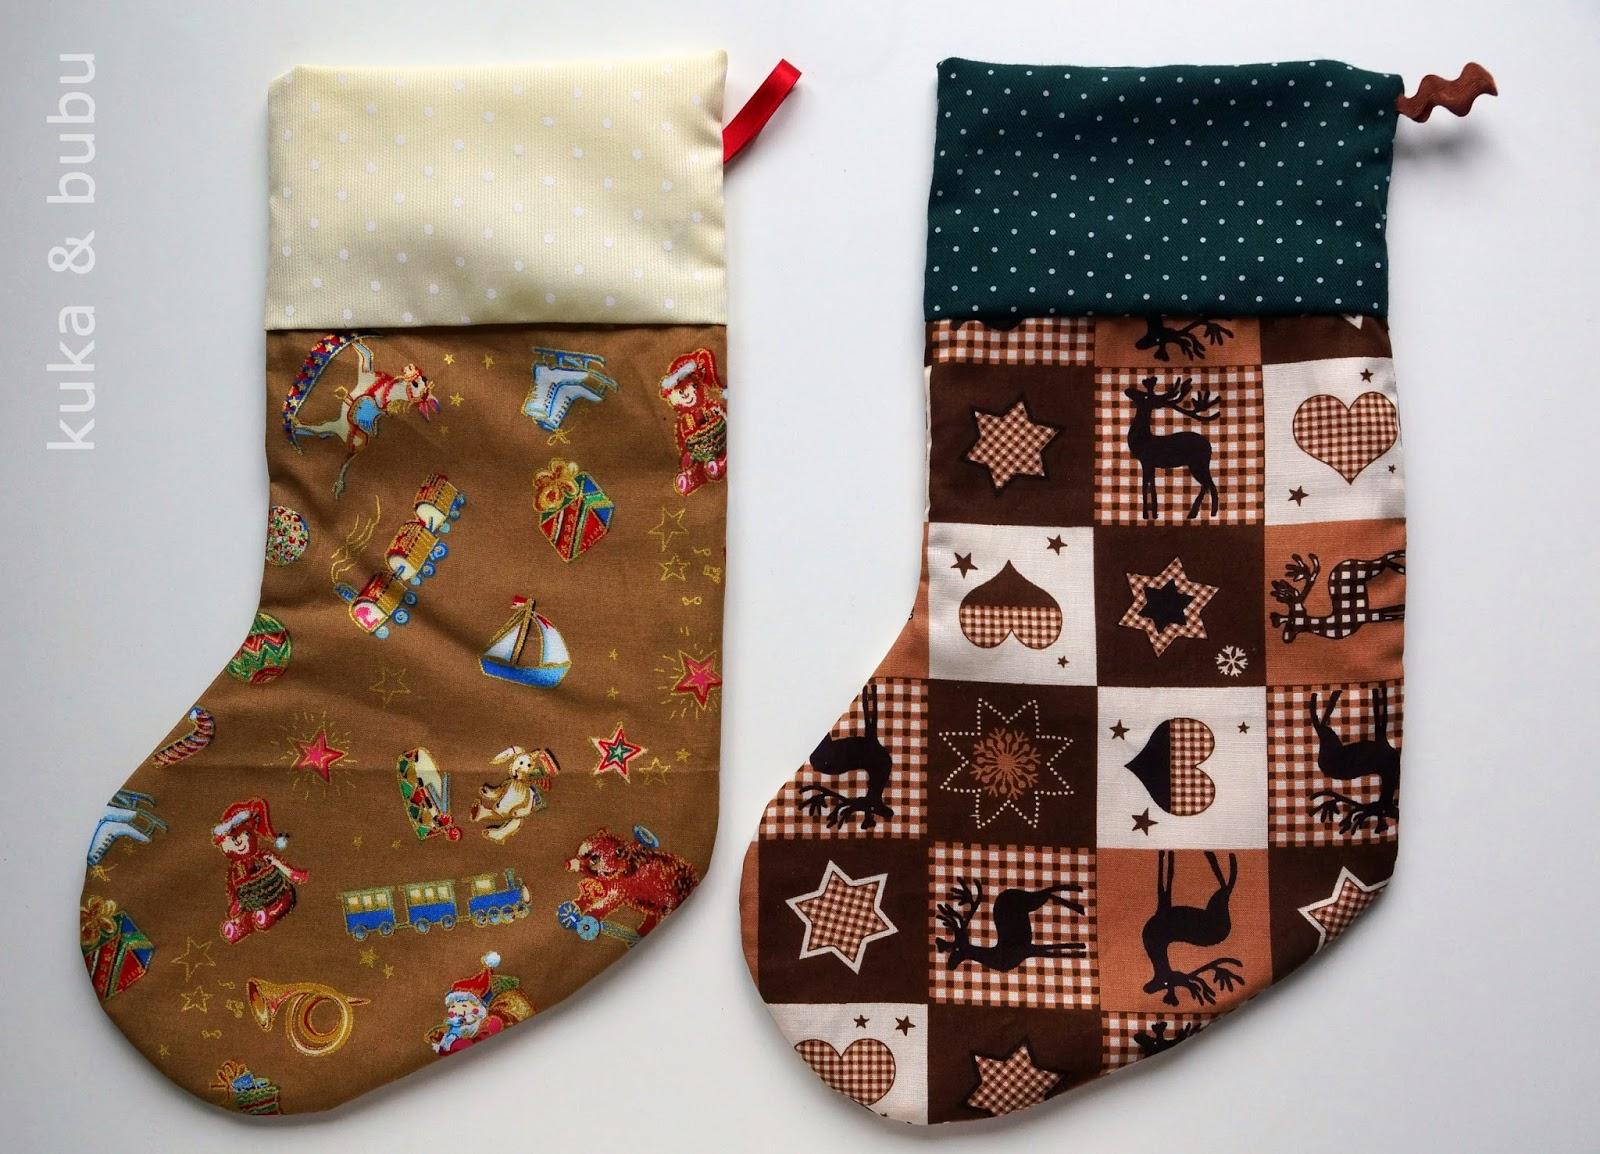 http://kukaandbubu.blogspot.com.es/2014/12/xmas-stockings-calcetines-de-navidad.html